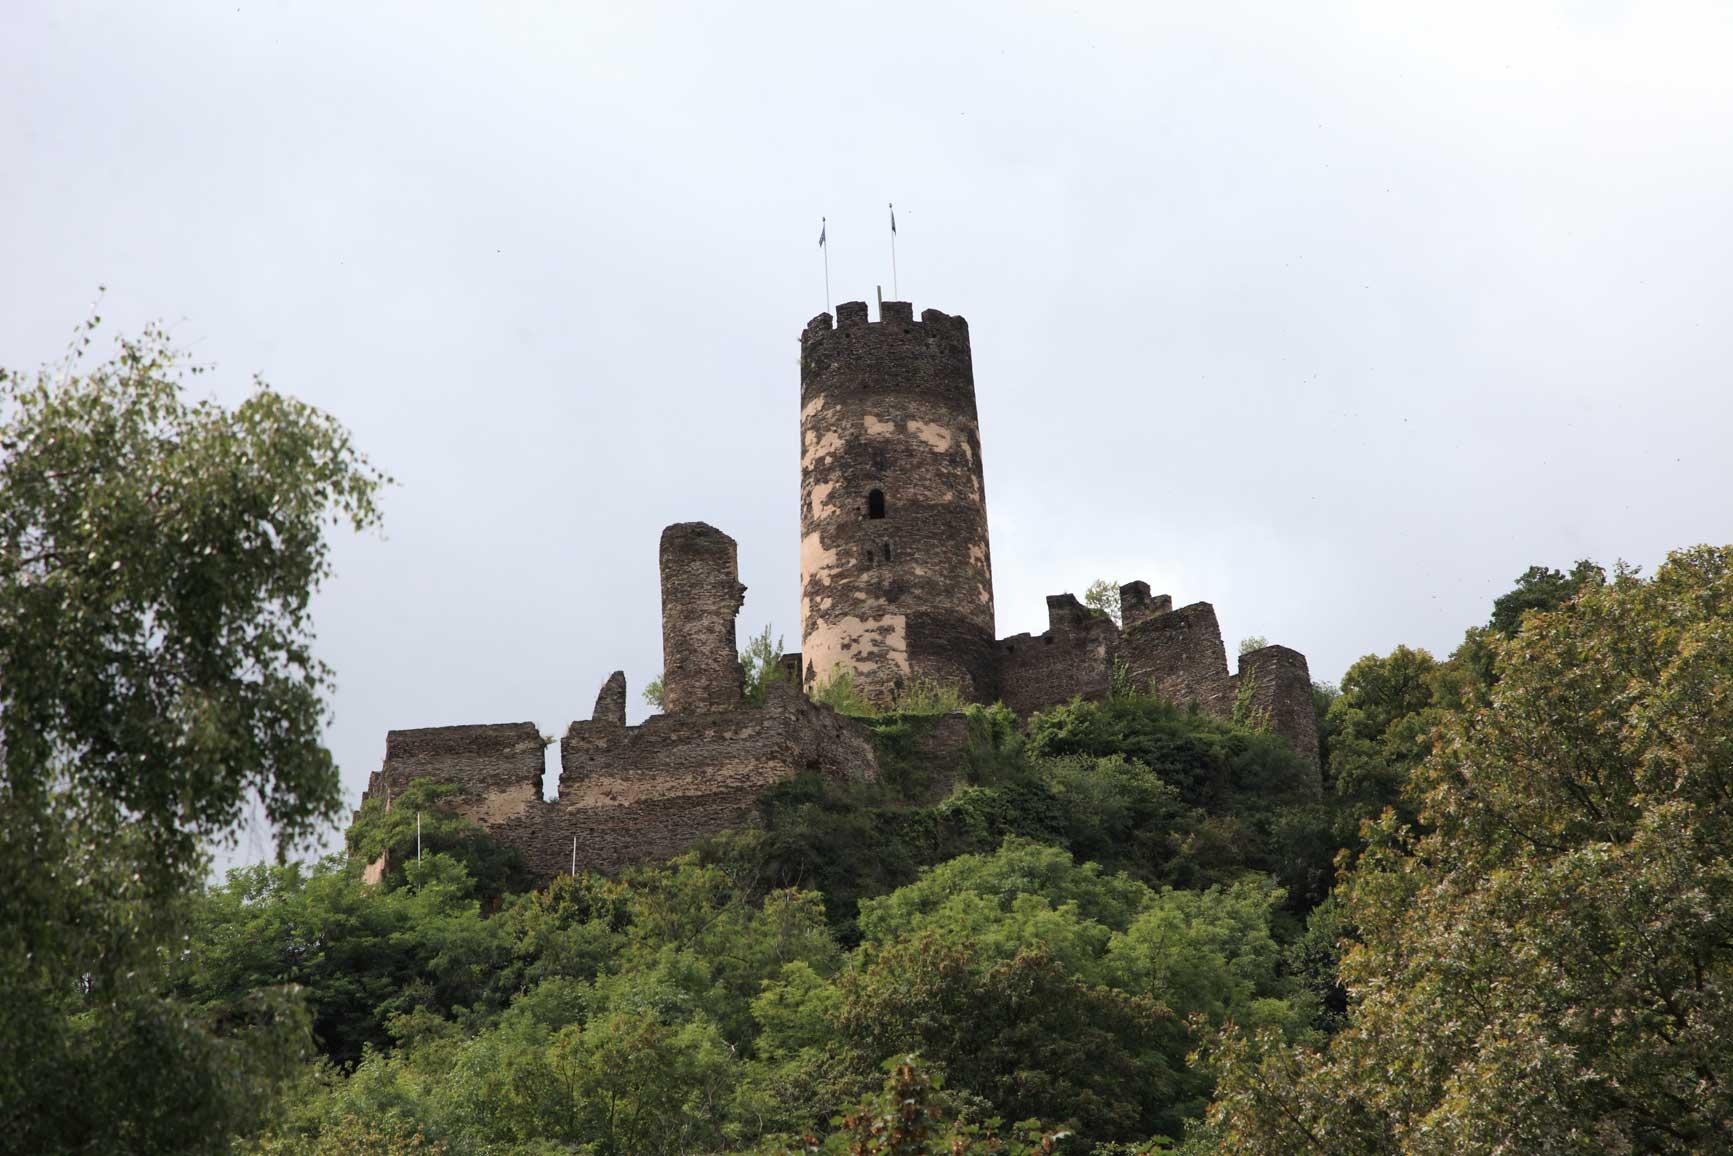 Rhine-15-08-14_15-22-09